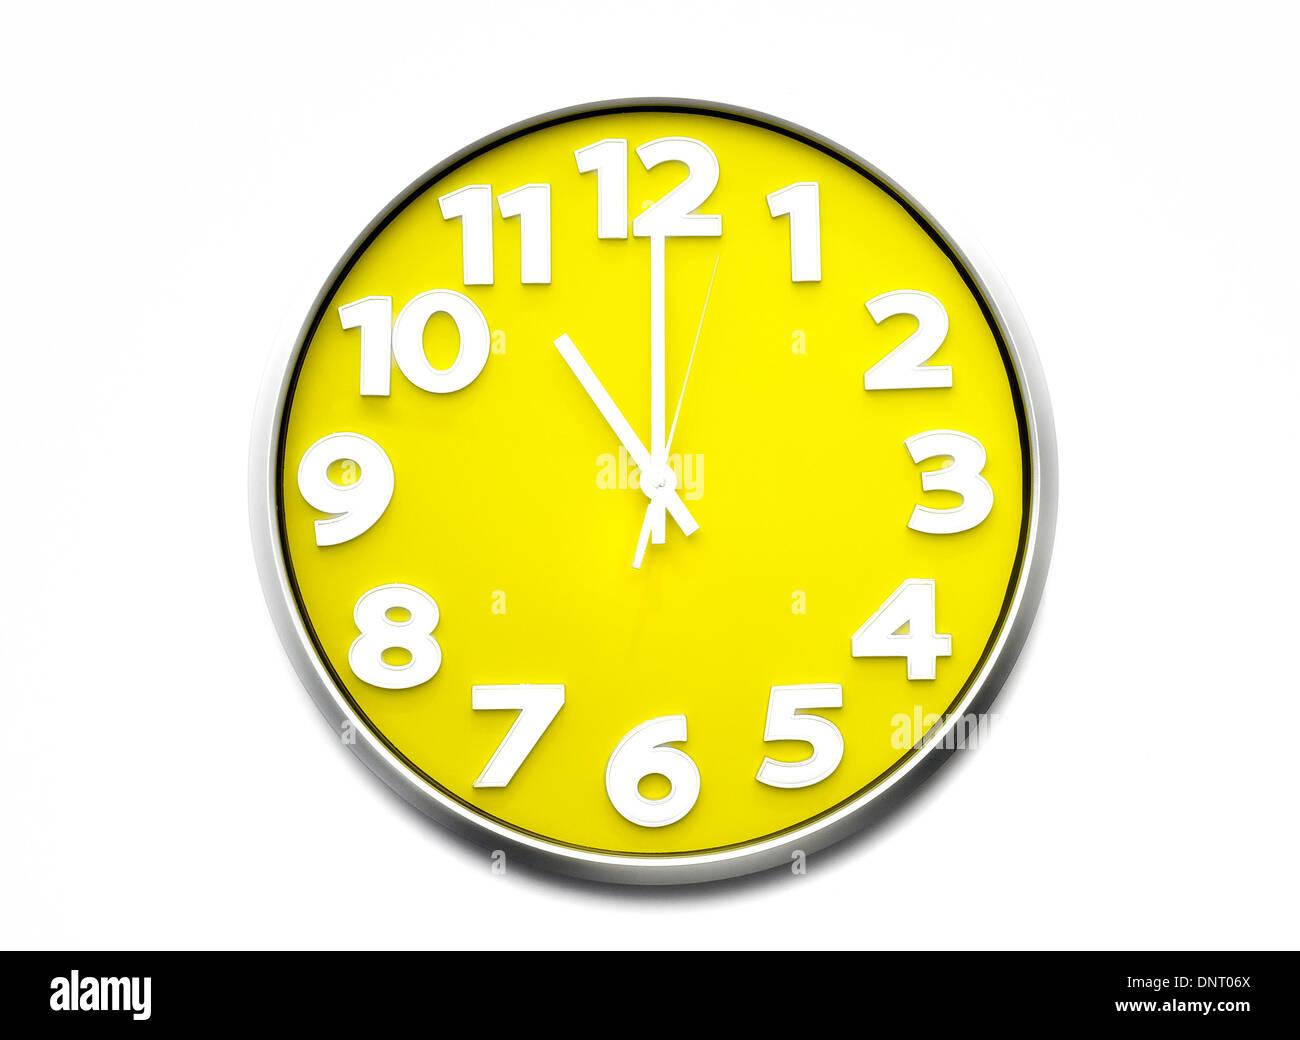 Minutes Past Nineteen Oclock